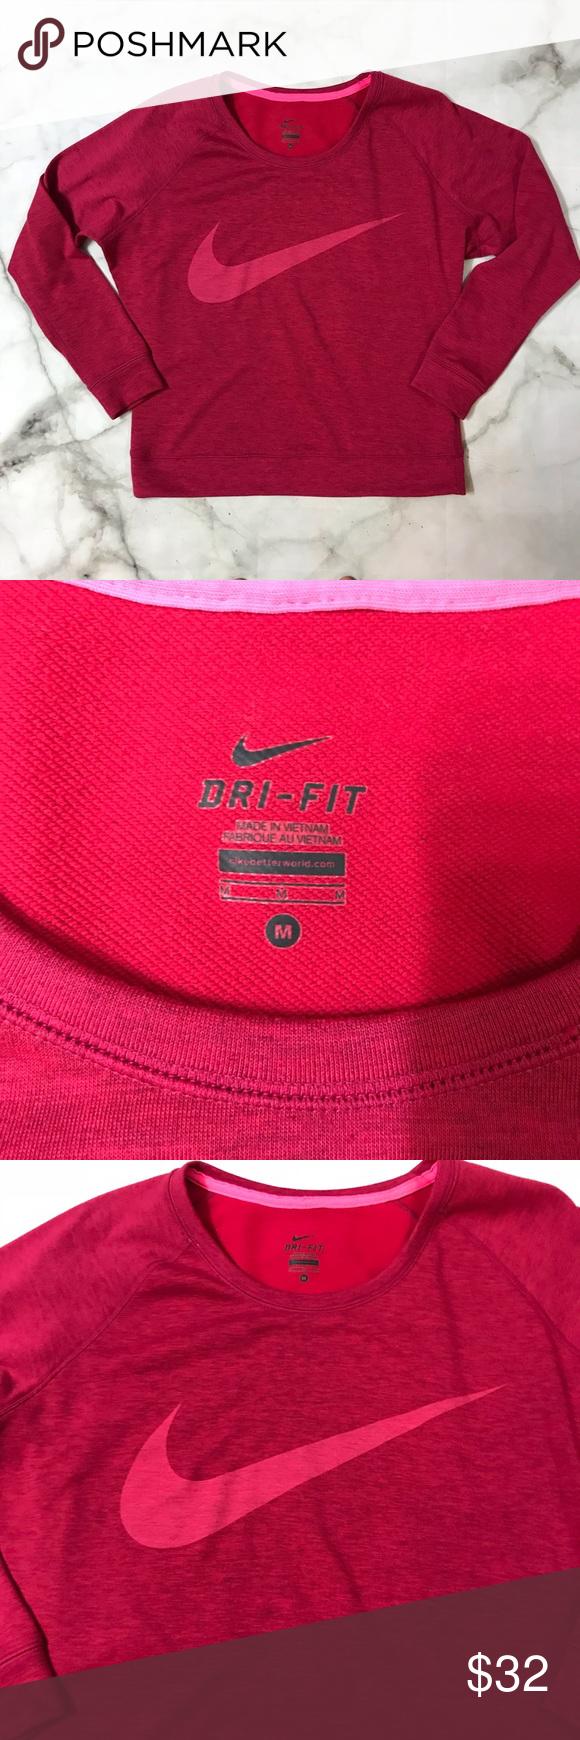 Nike Dri Fit Crewneck Sweatshirt Crew Neck Sweatshirt Sweatshirts Colorful Sweatshirt [ 1740 x 580 Pixel ]